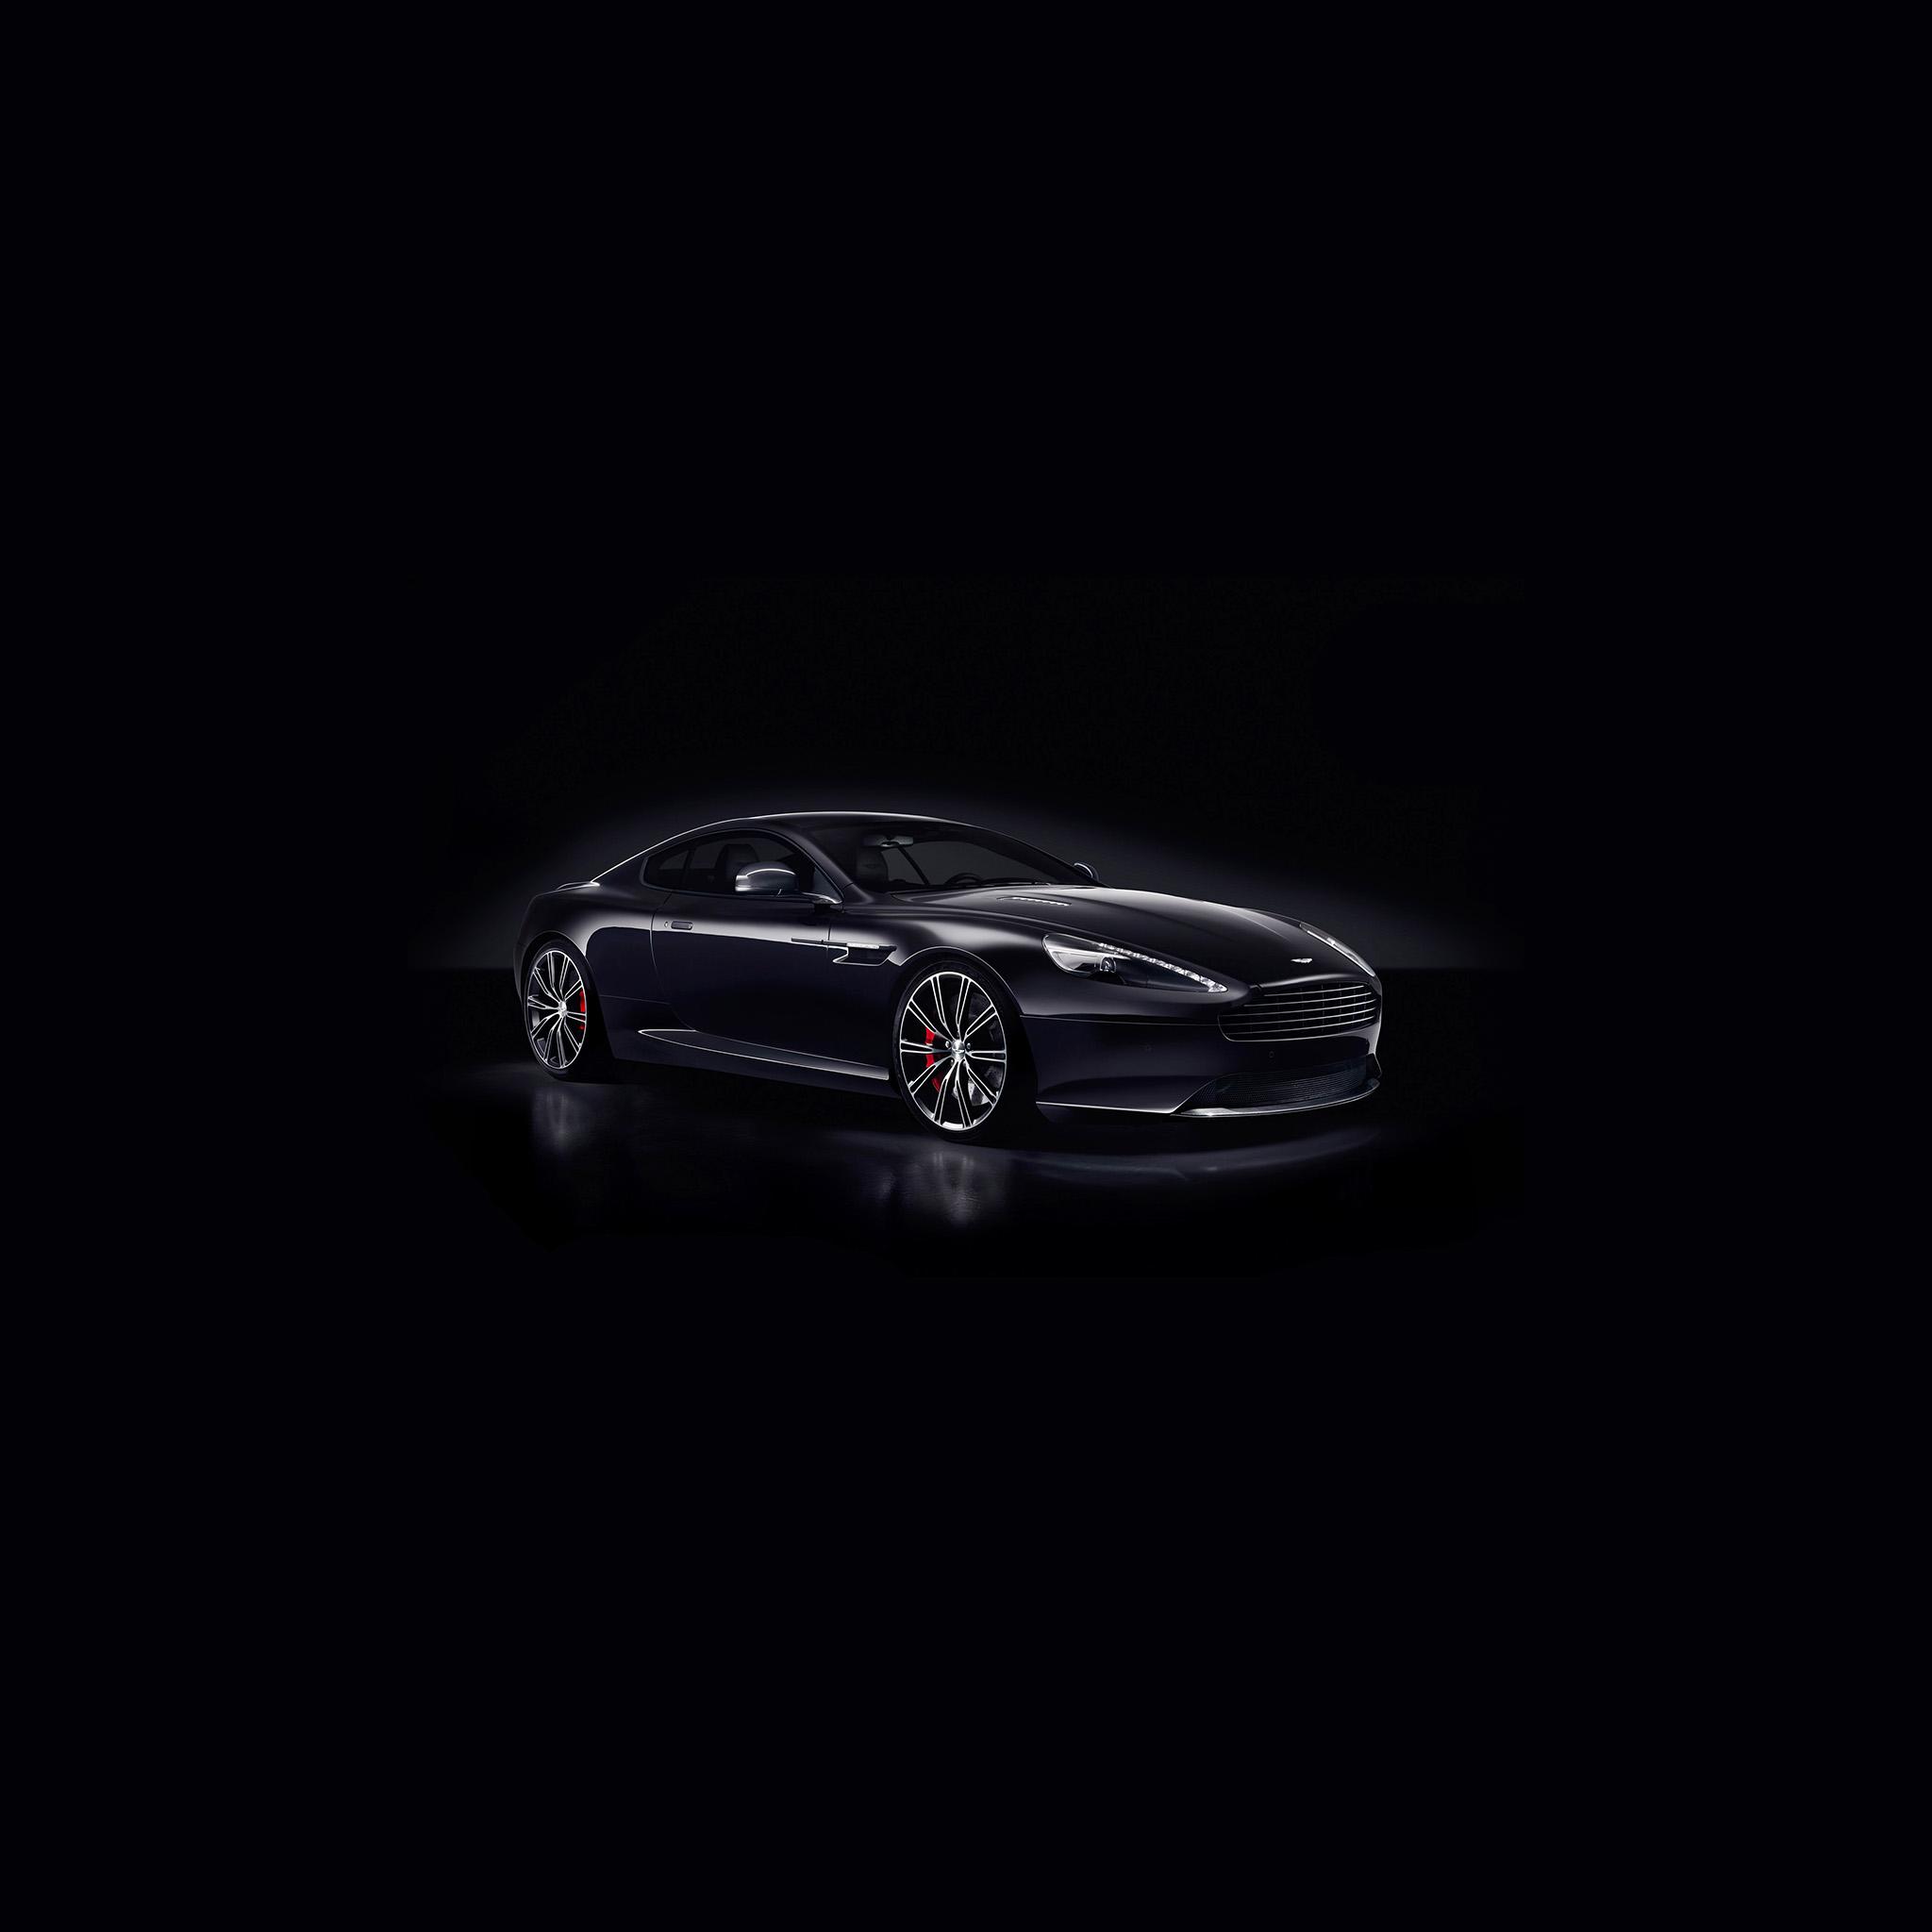 Aston Martin Car Wallpaper: WALLPAPERS